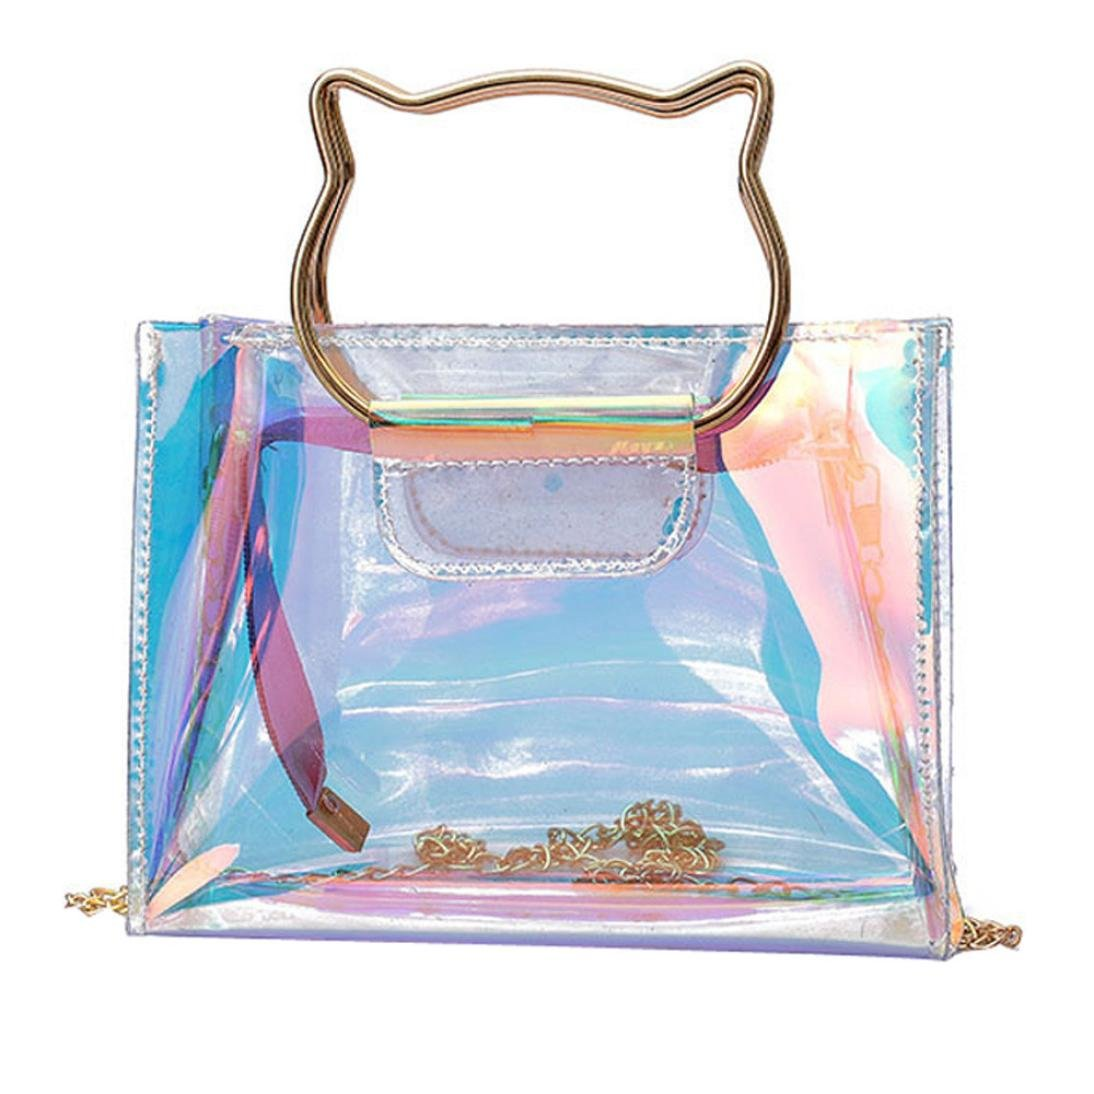 Alixyz Women Transparent Candy Color Handbag Beach Bag Jelly Bag Girls Mini Chain Shoulder Bag (M, Multicolor)